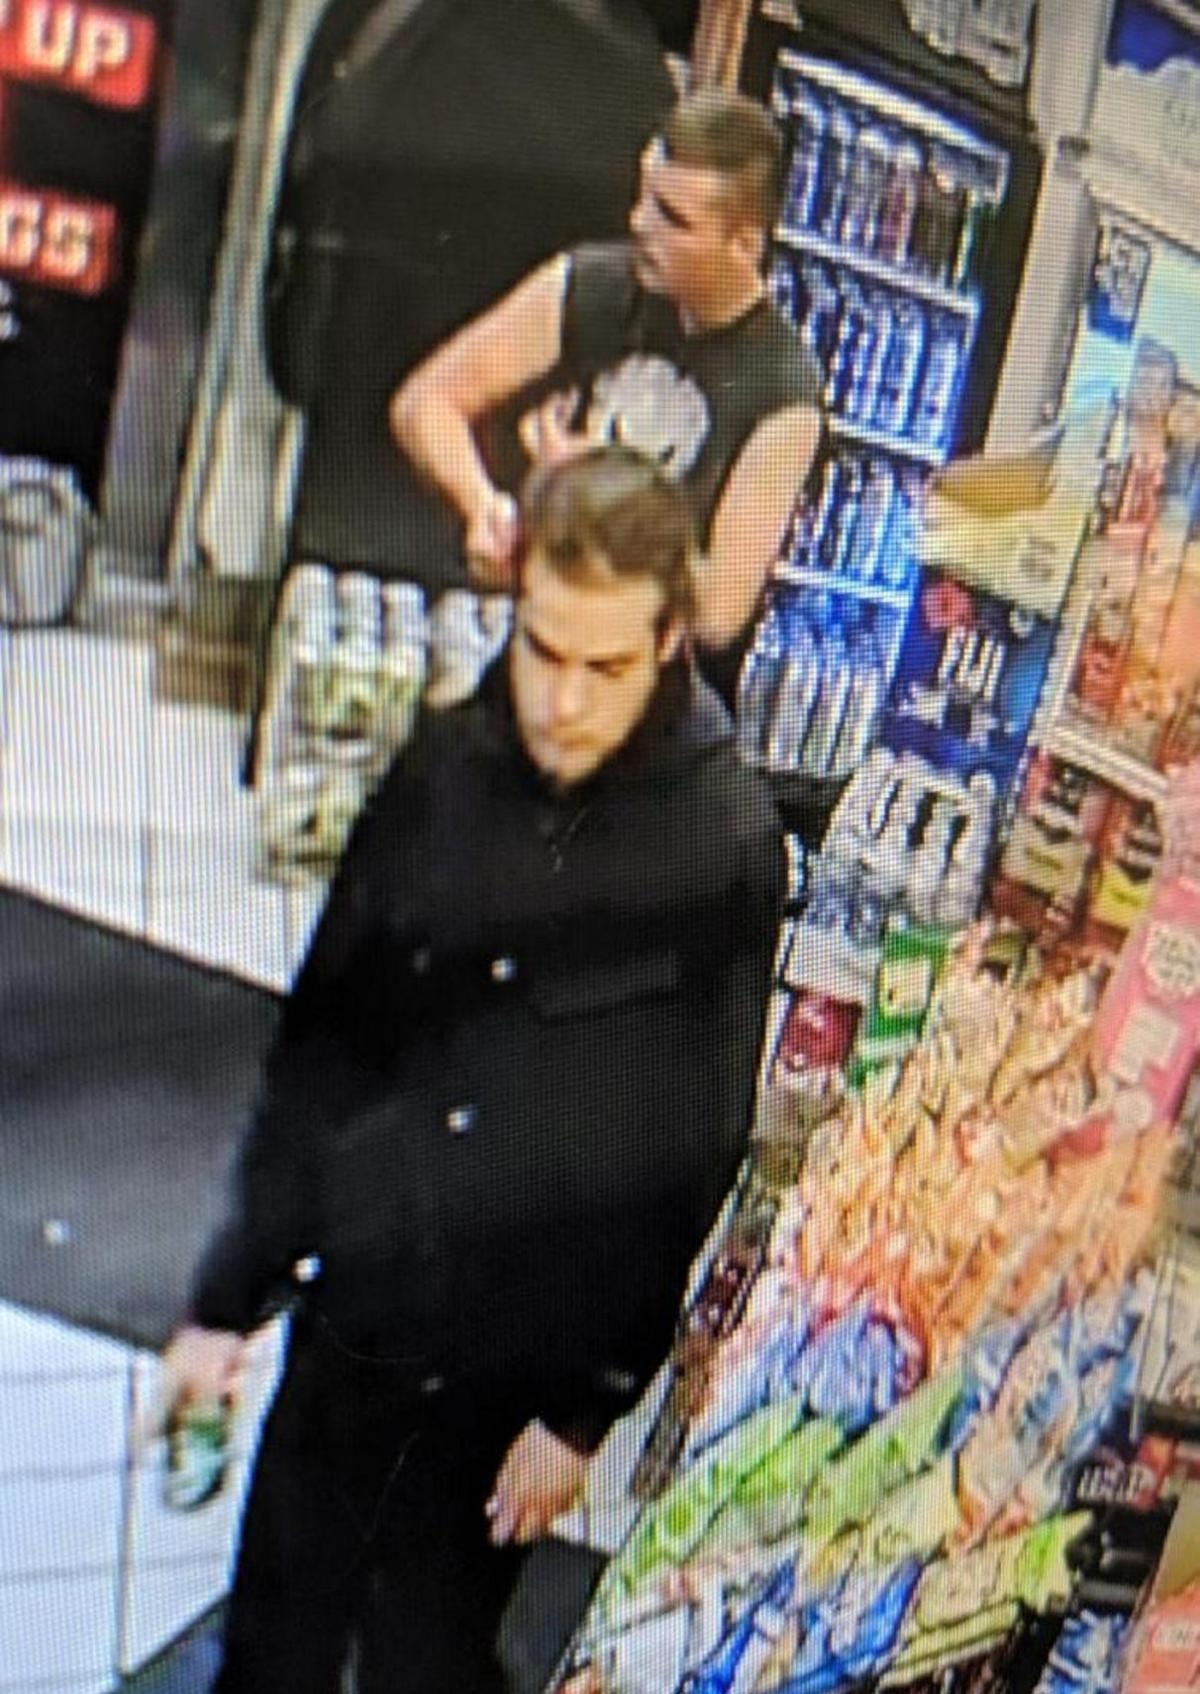 Police seek identity of two in larceny investigation